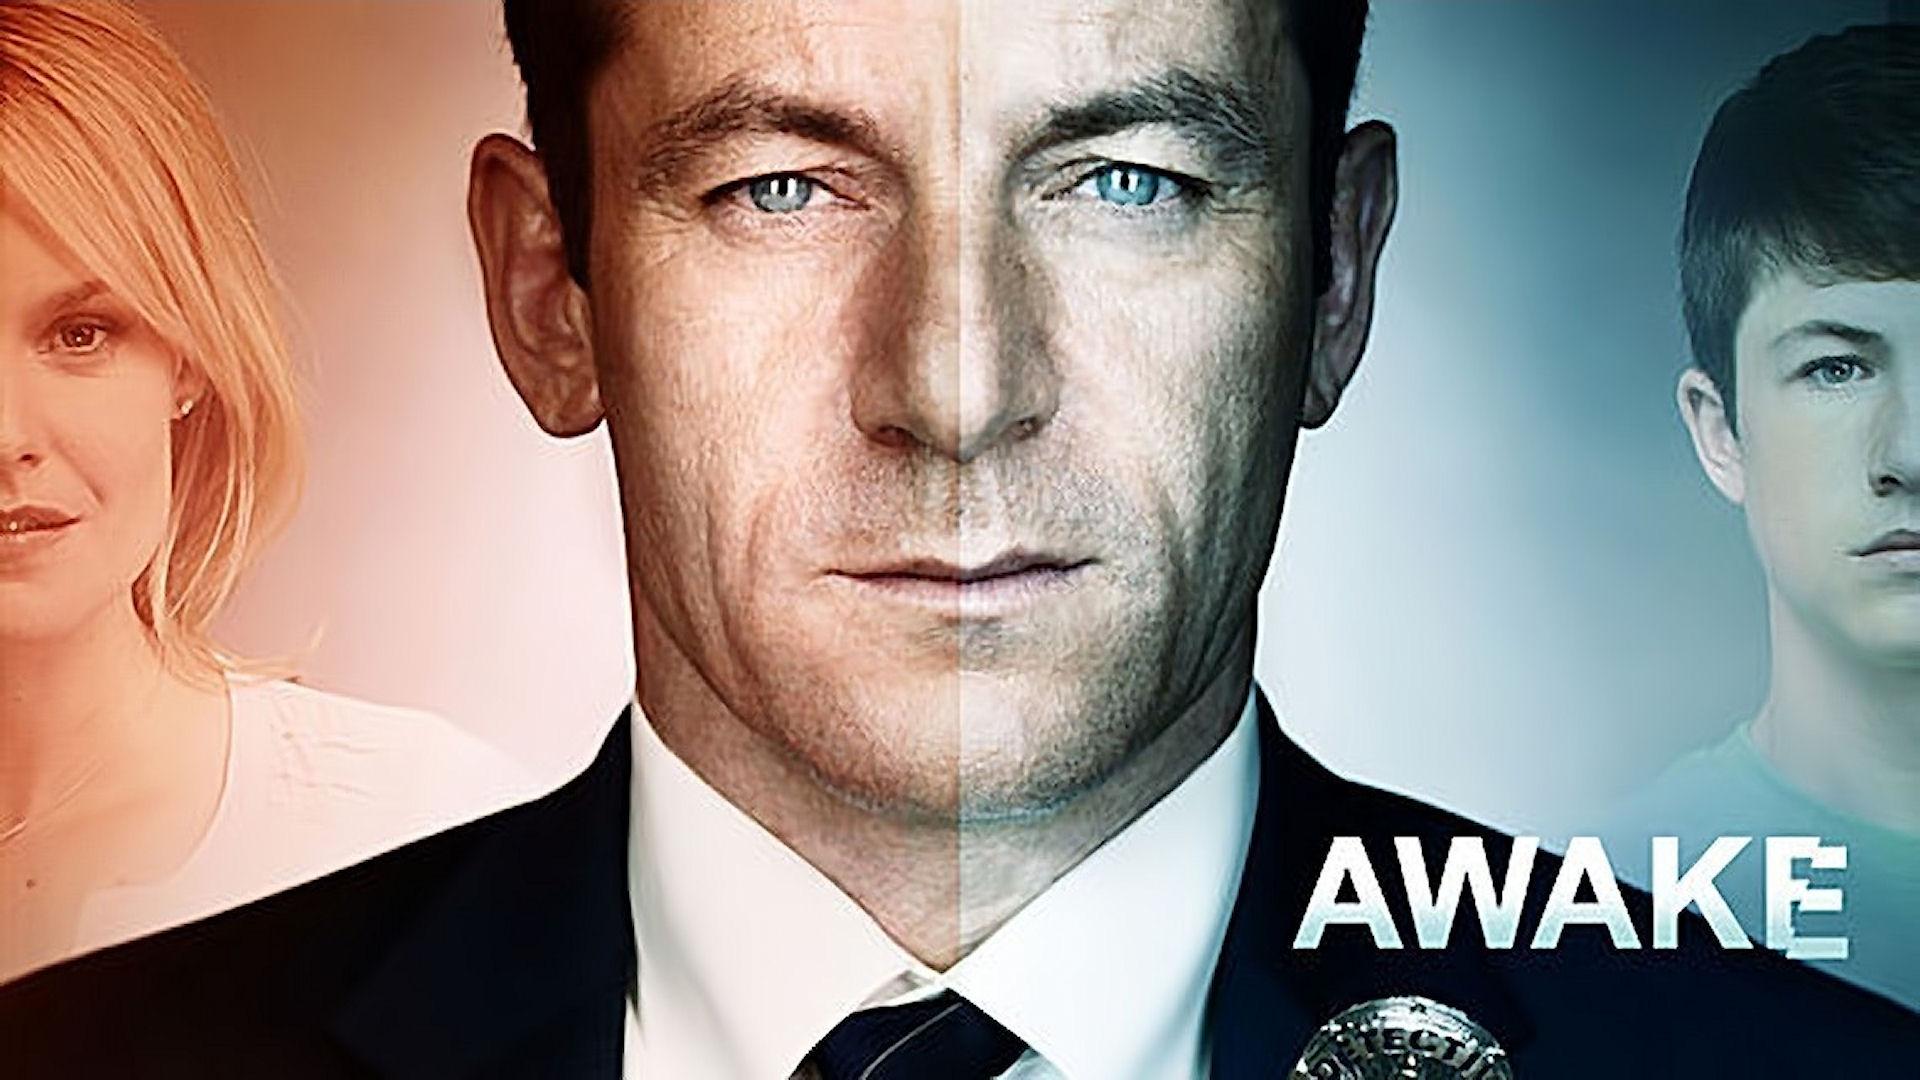 Awake [NBC] images Awake HD wallpaper and background photos